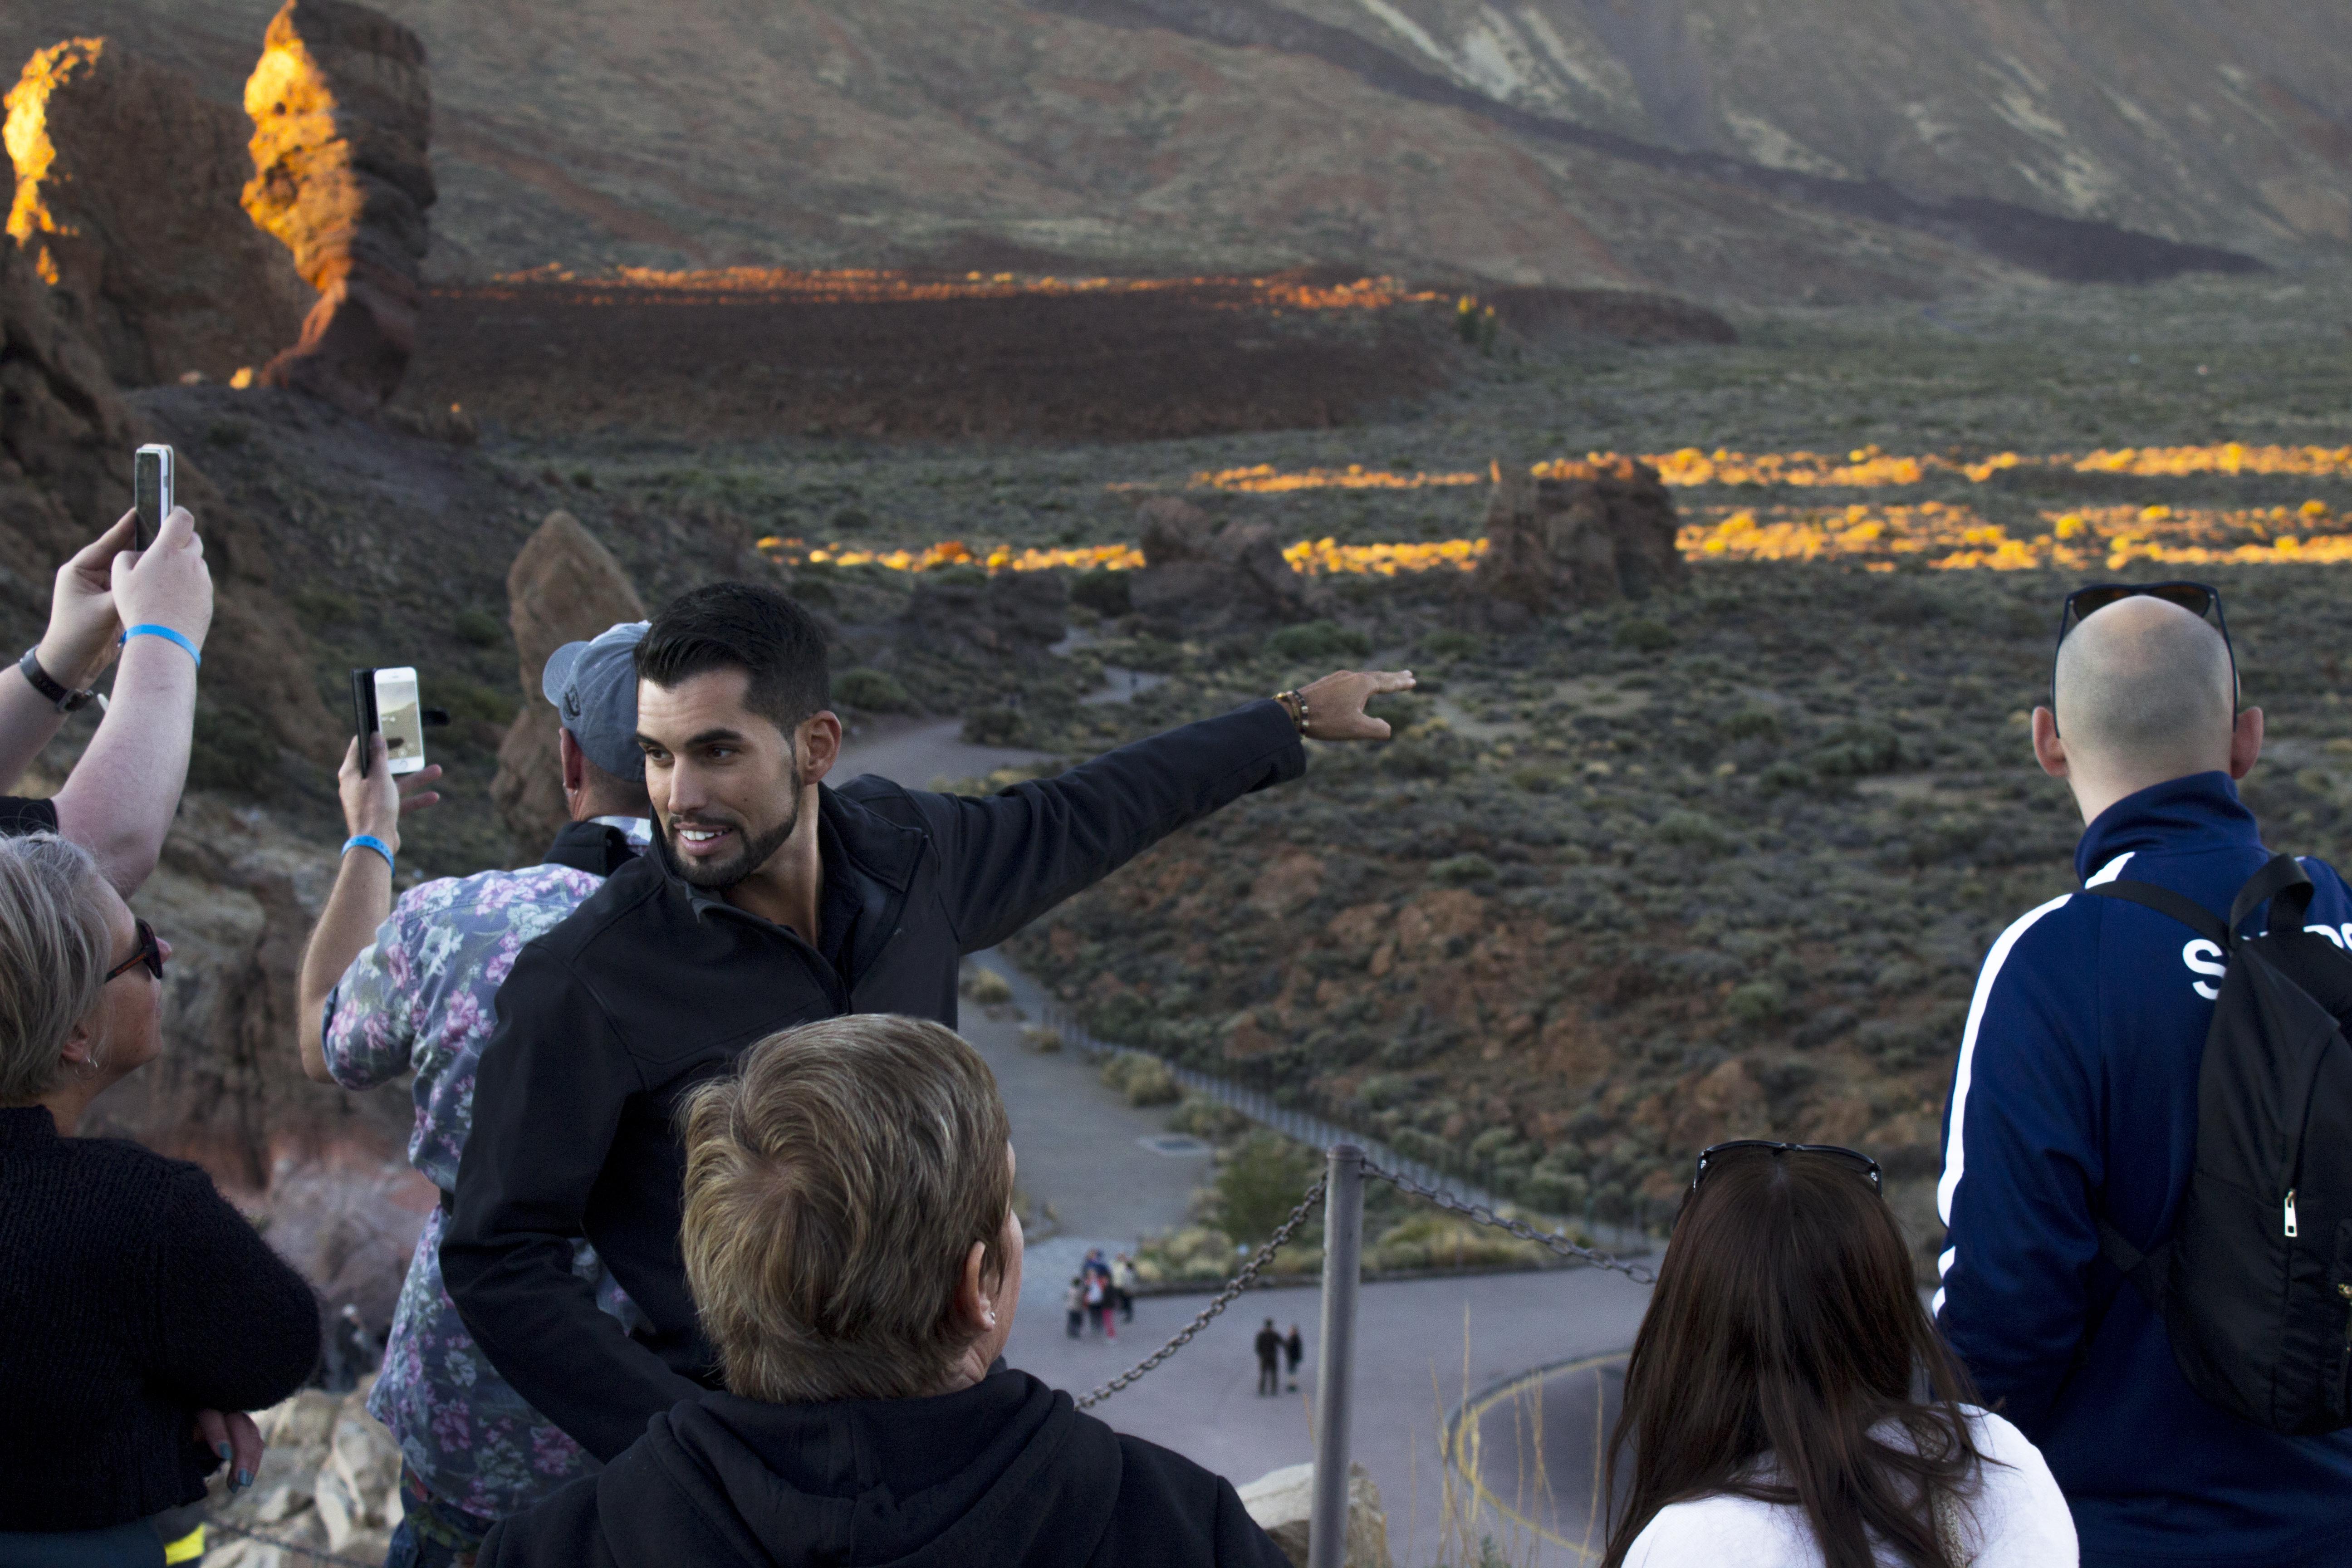 tour guide explaining the Teide national park landscape to a group